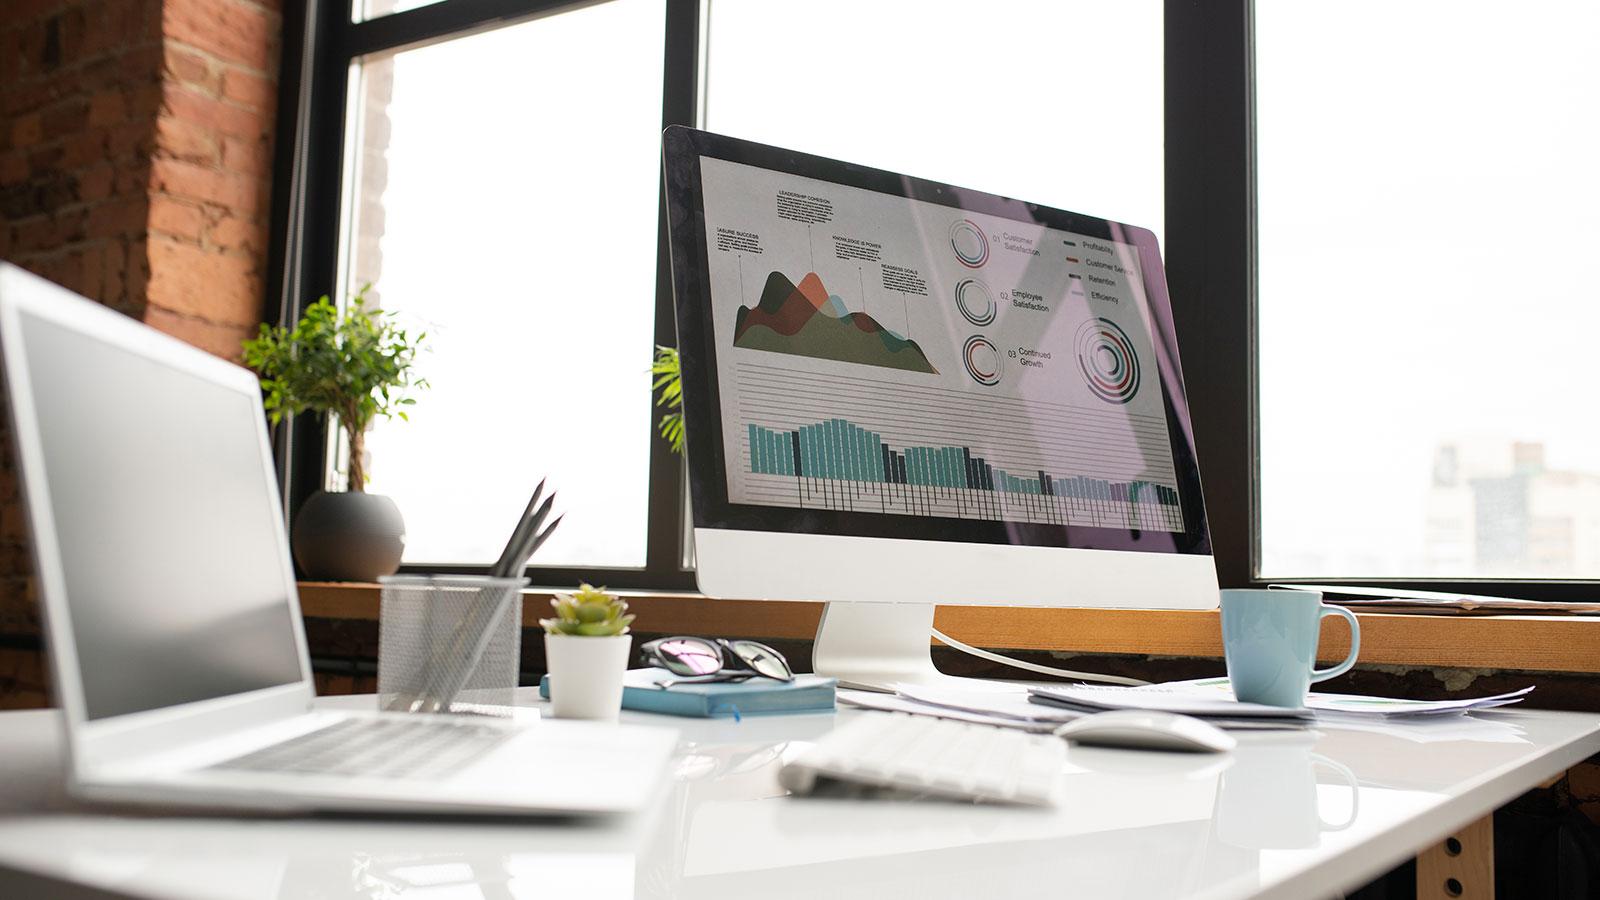 5 razoes para investir videos de animacao 3 - 5 razões para você investir em vídeos de animação para a sua empresa